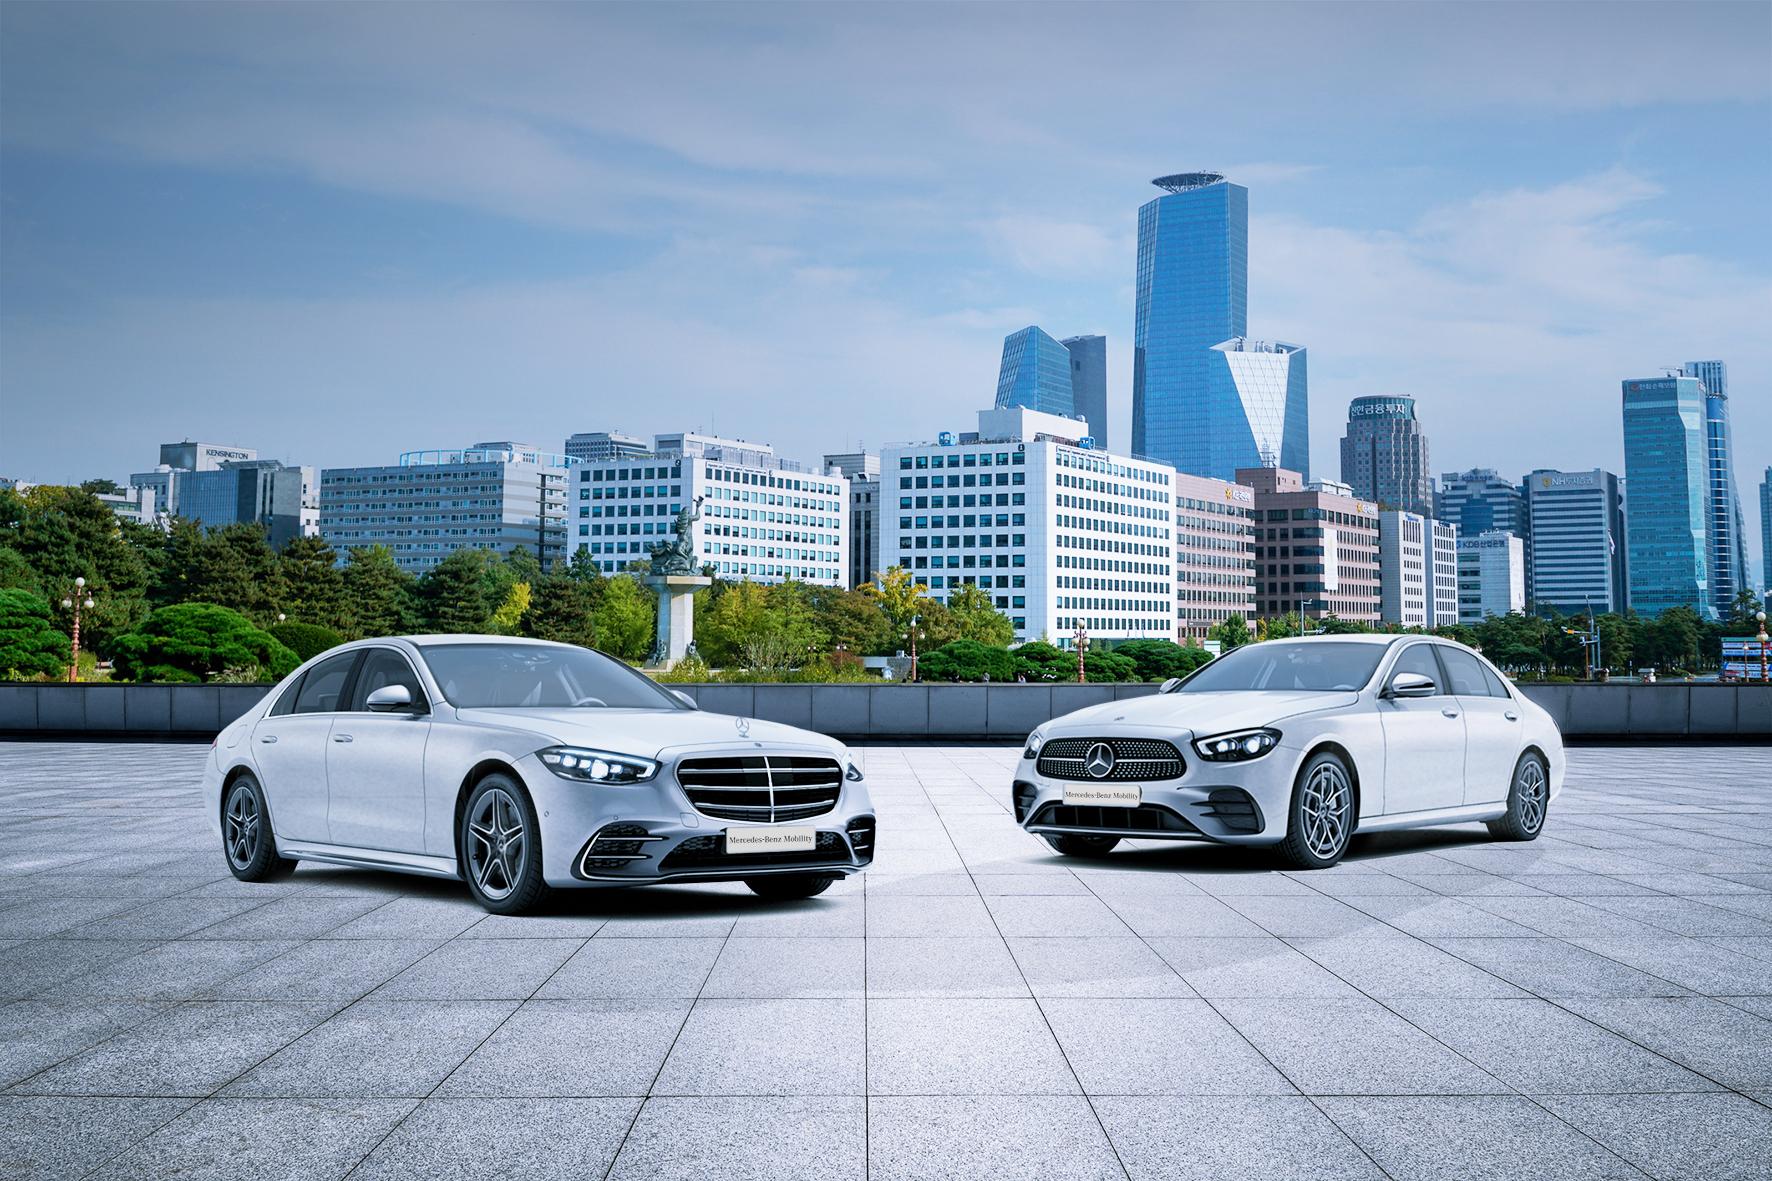 Mercedes-Benz Mobility Korea